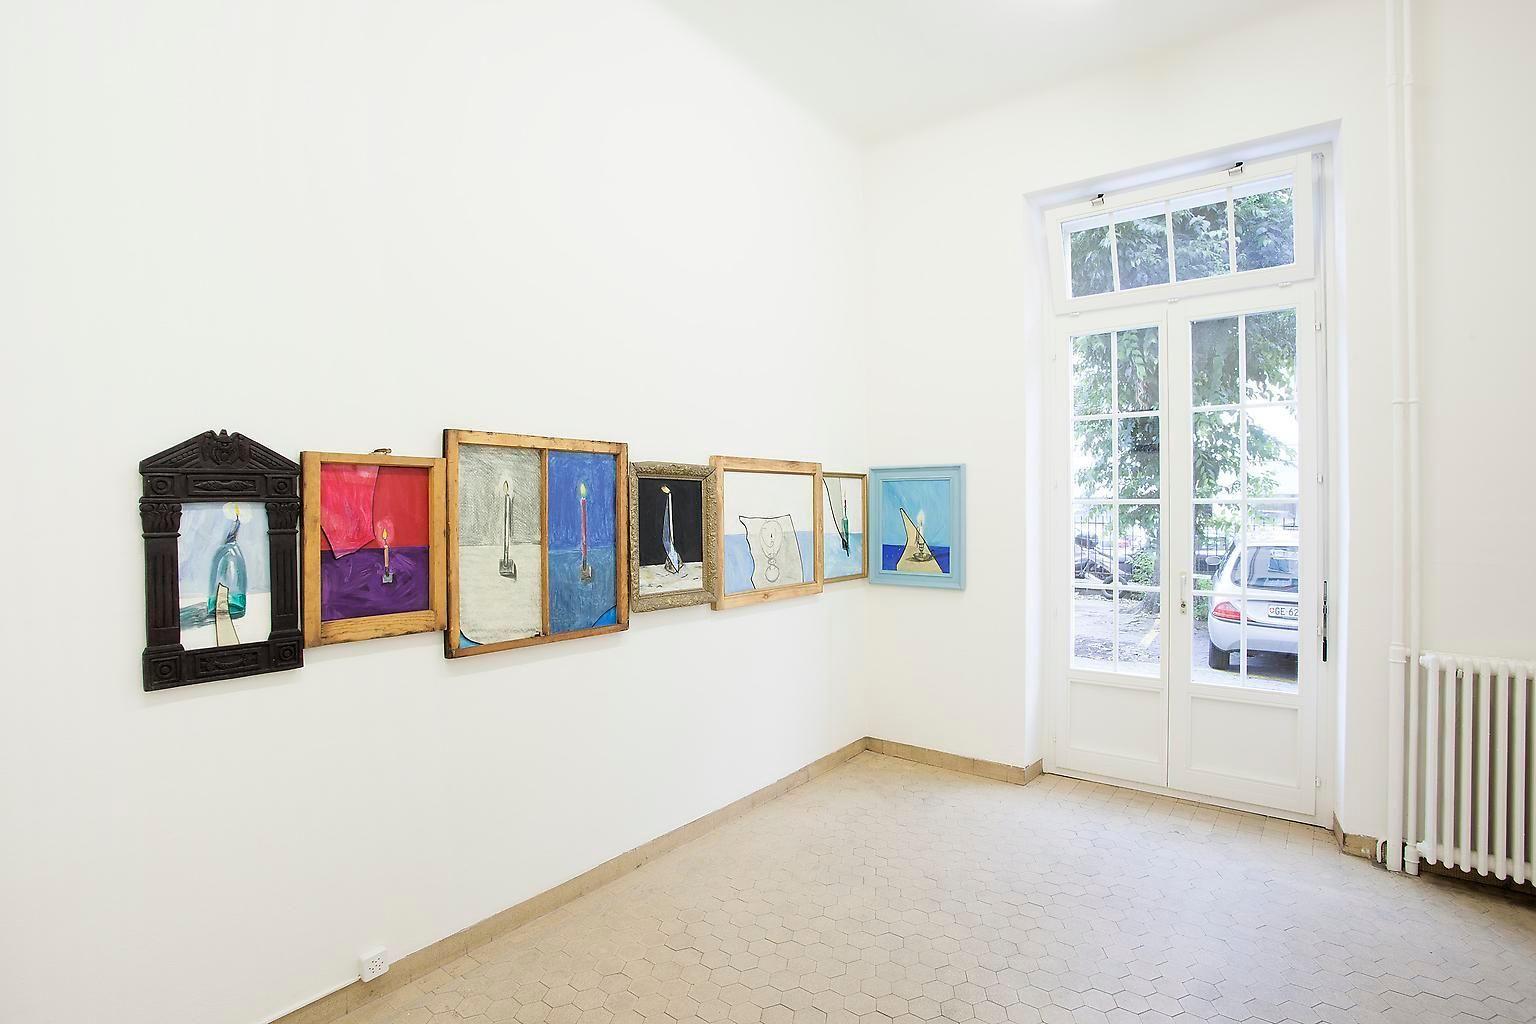 Installation view, Vahakn Arslanian, Wings of Light, Marc Jancou, Geneva, September 12 - November 2, 2013